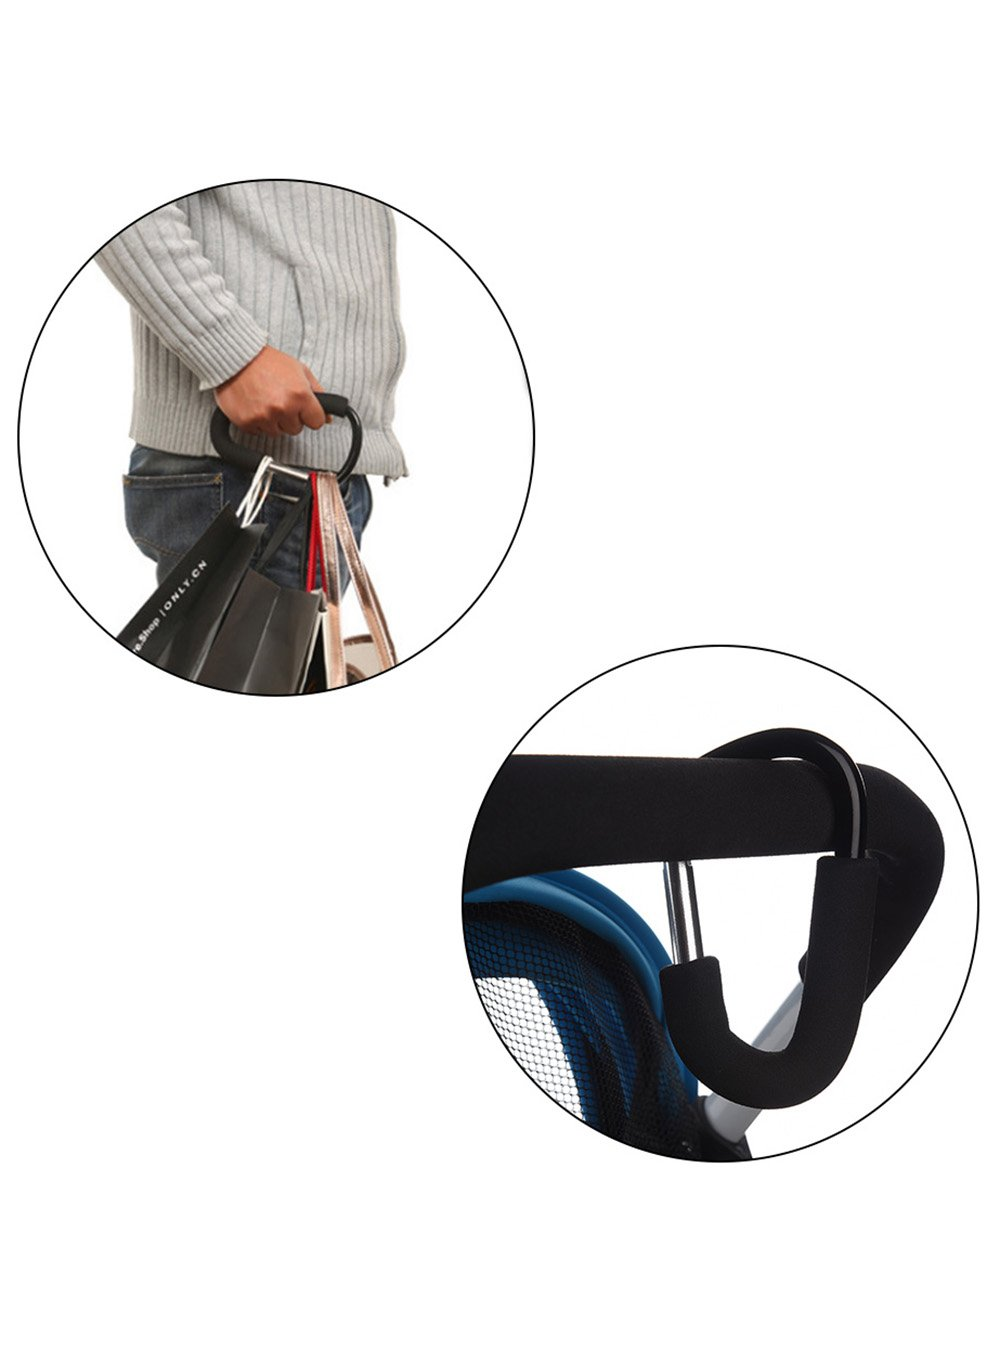 Black Snowmanna-2PCS D-Type Carabiner with Thickening Sponge Pushchair Pram Hook Shopping Diaper Bag Hanger Multipurpose Stroller Accessories Universal Mummy Buggy Clips Plus Free Bonus Keyrings